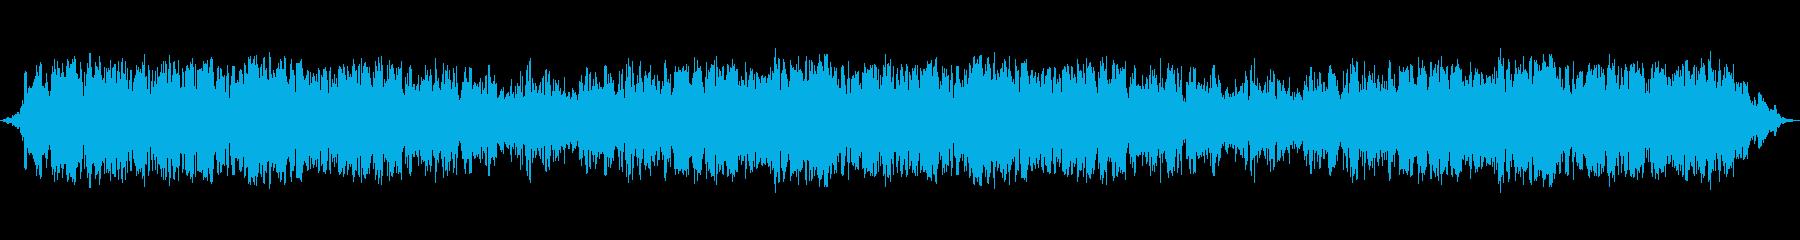 HIGH HARSH HOWLIN...の再生済みの波形